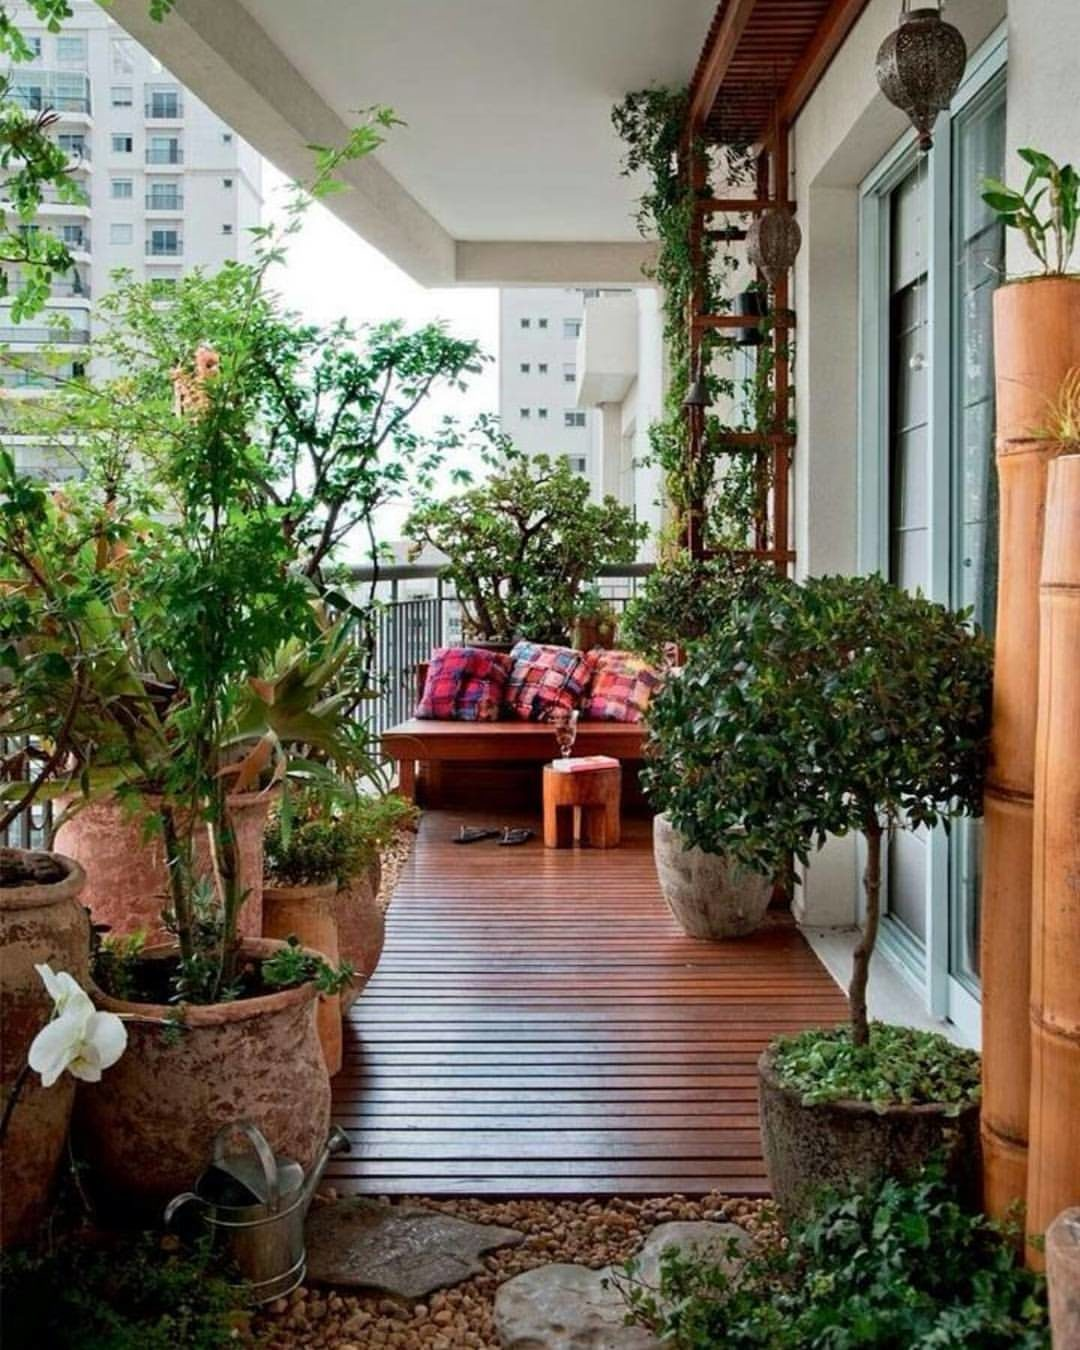 "Сад на балконе"" - карточка пользователя kolenda.yuliya в Янд."